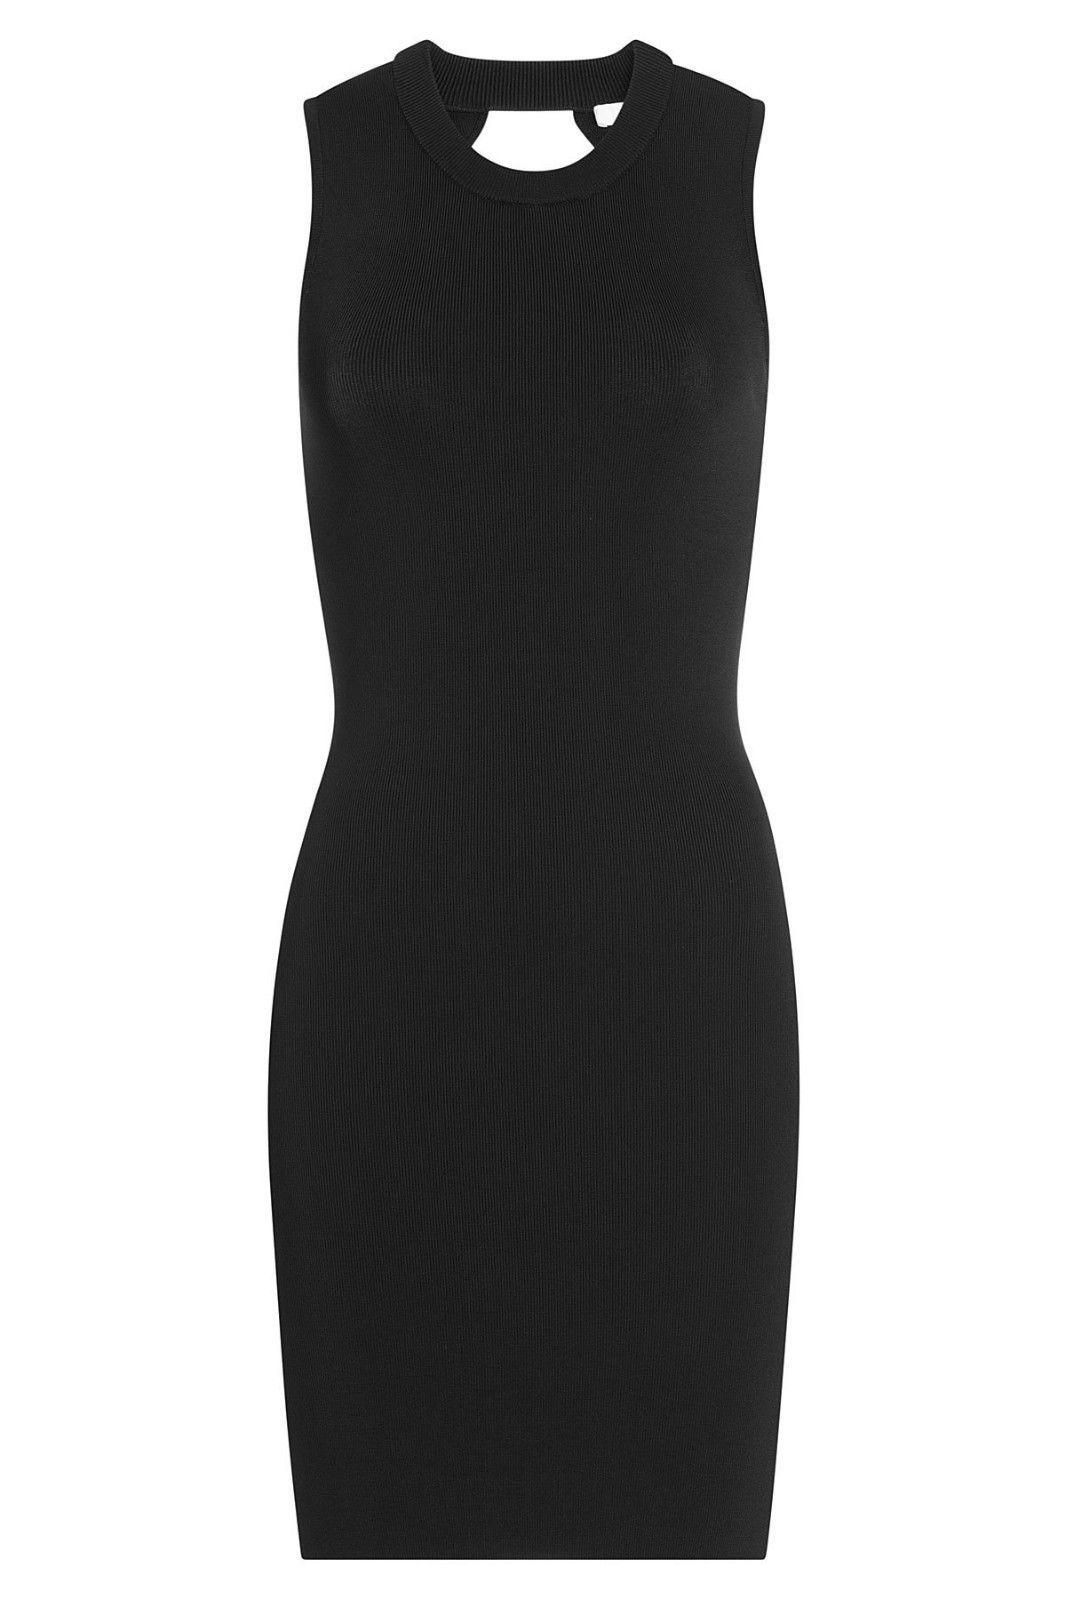 T BY ALEXANDER WANG Jersey Dress with Cut-Out Detail Medium $469.00